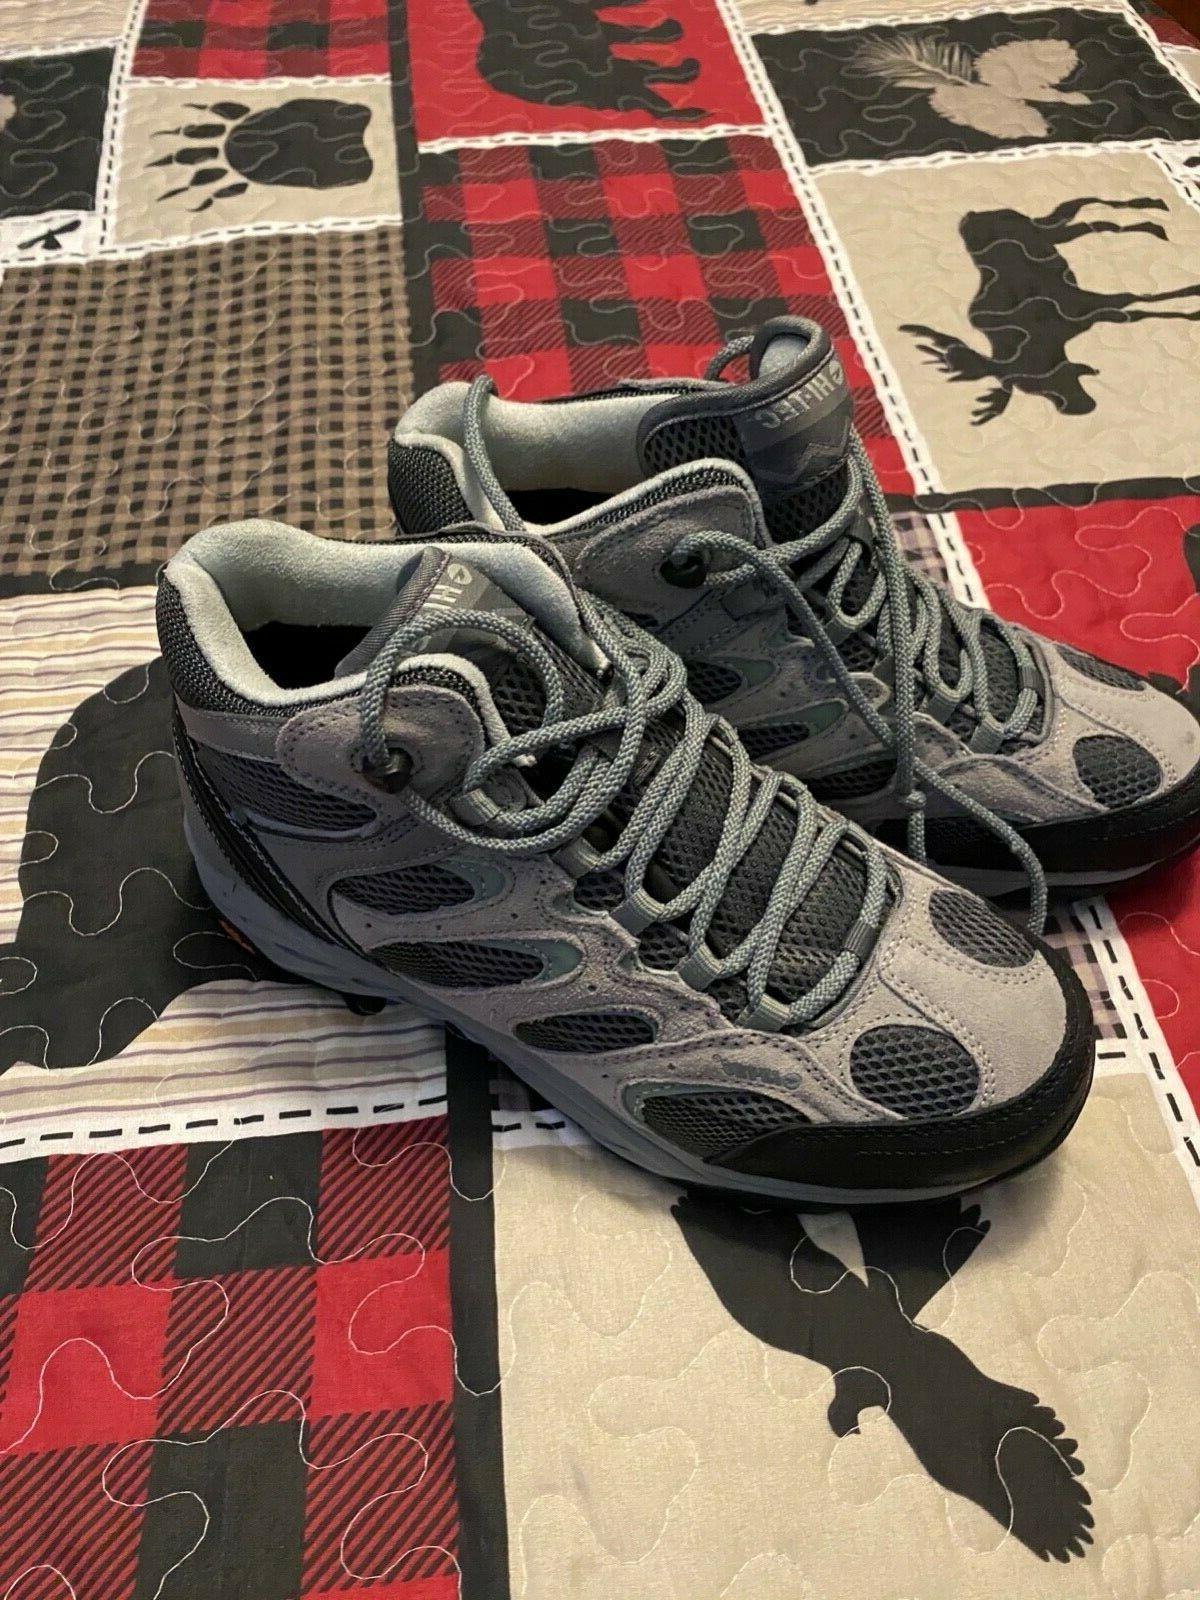 New Hi-Tec hiking boots size 9.5